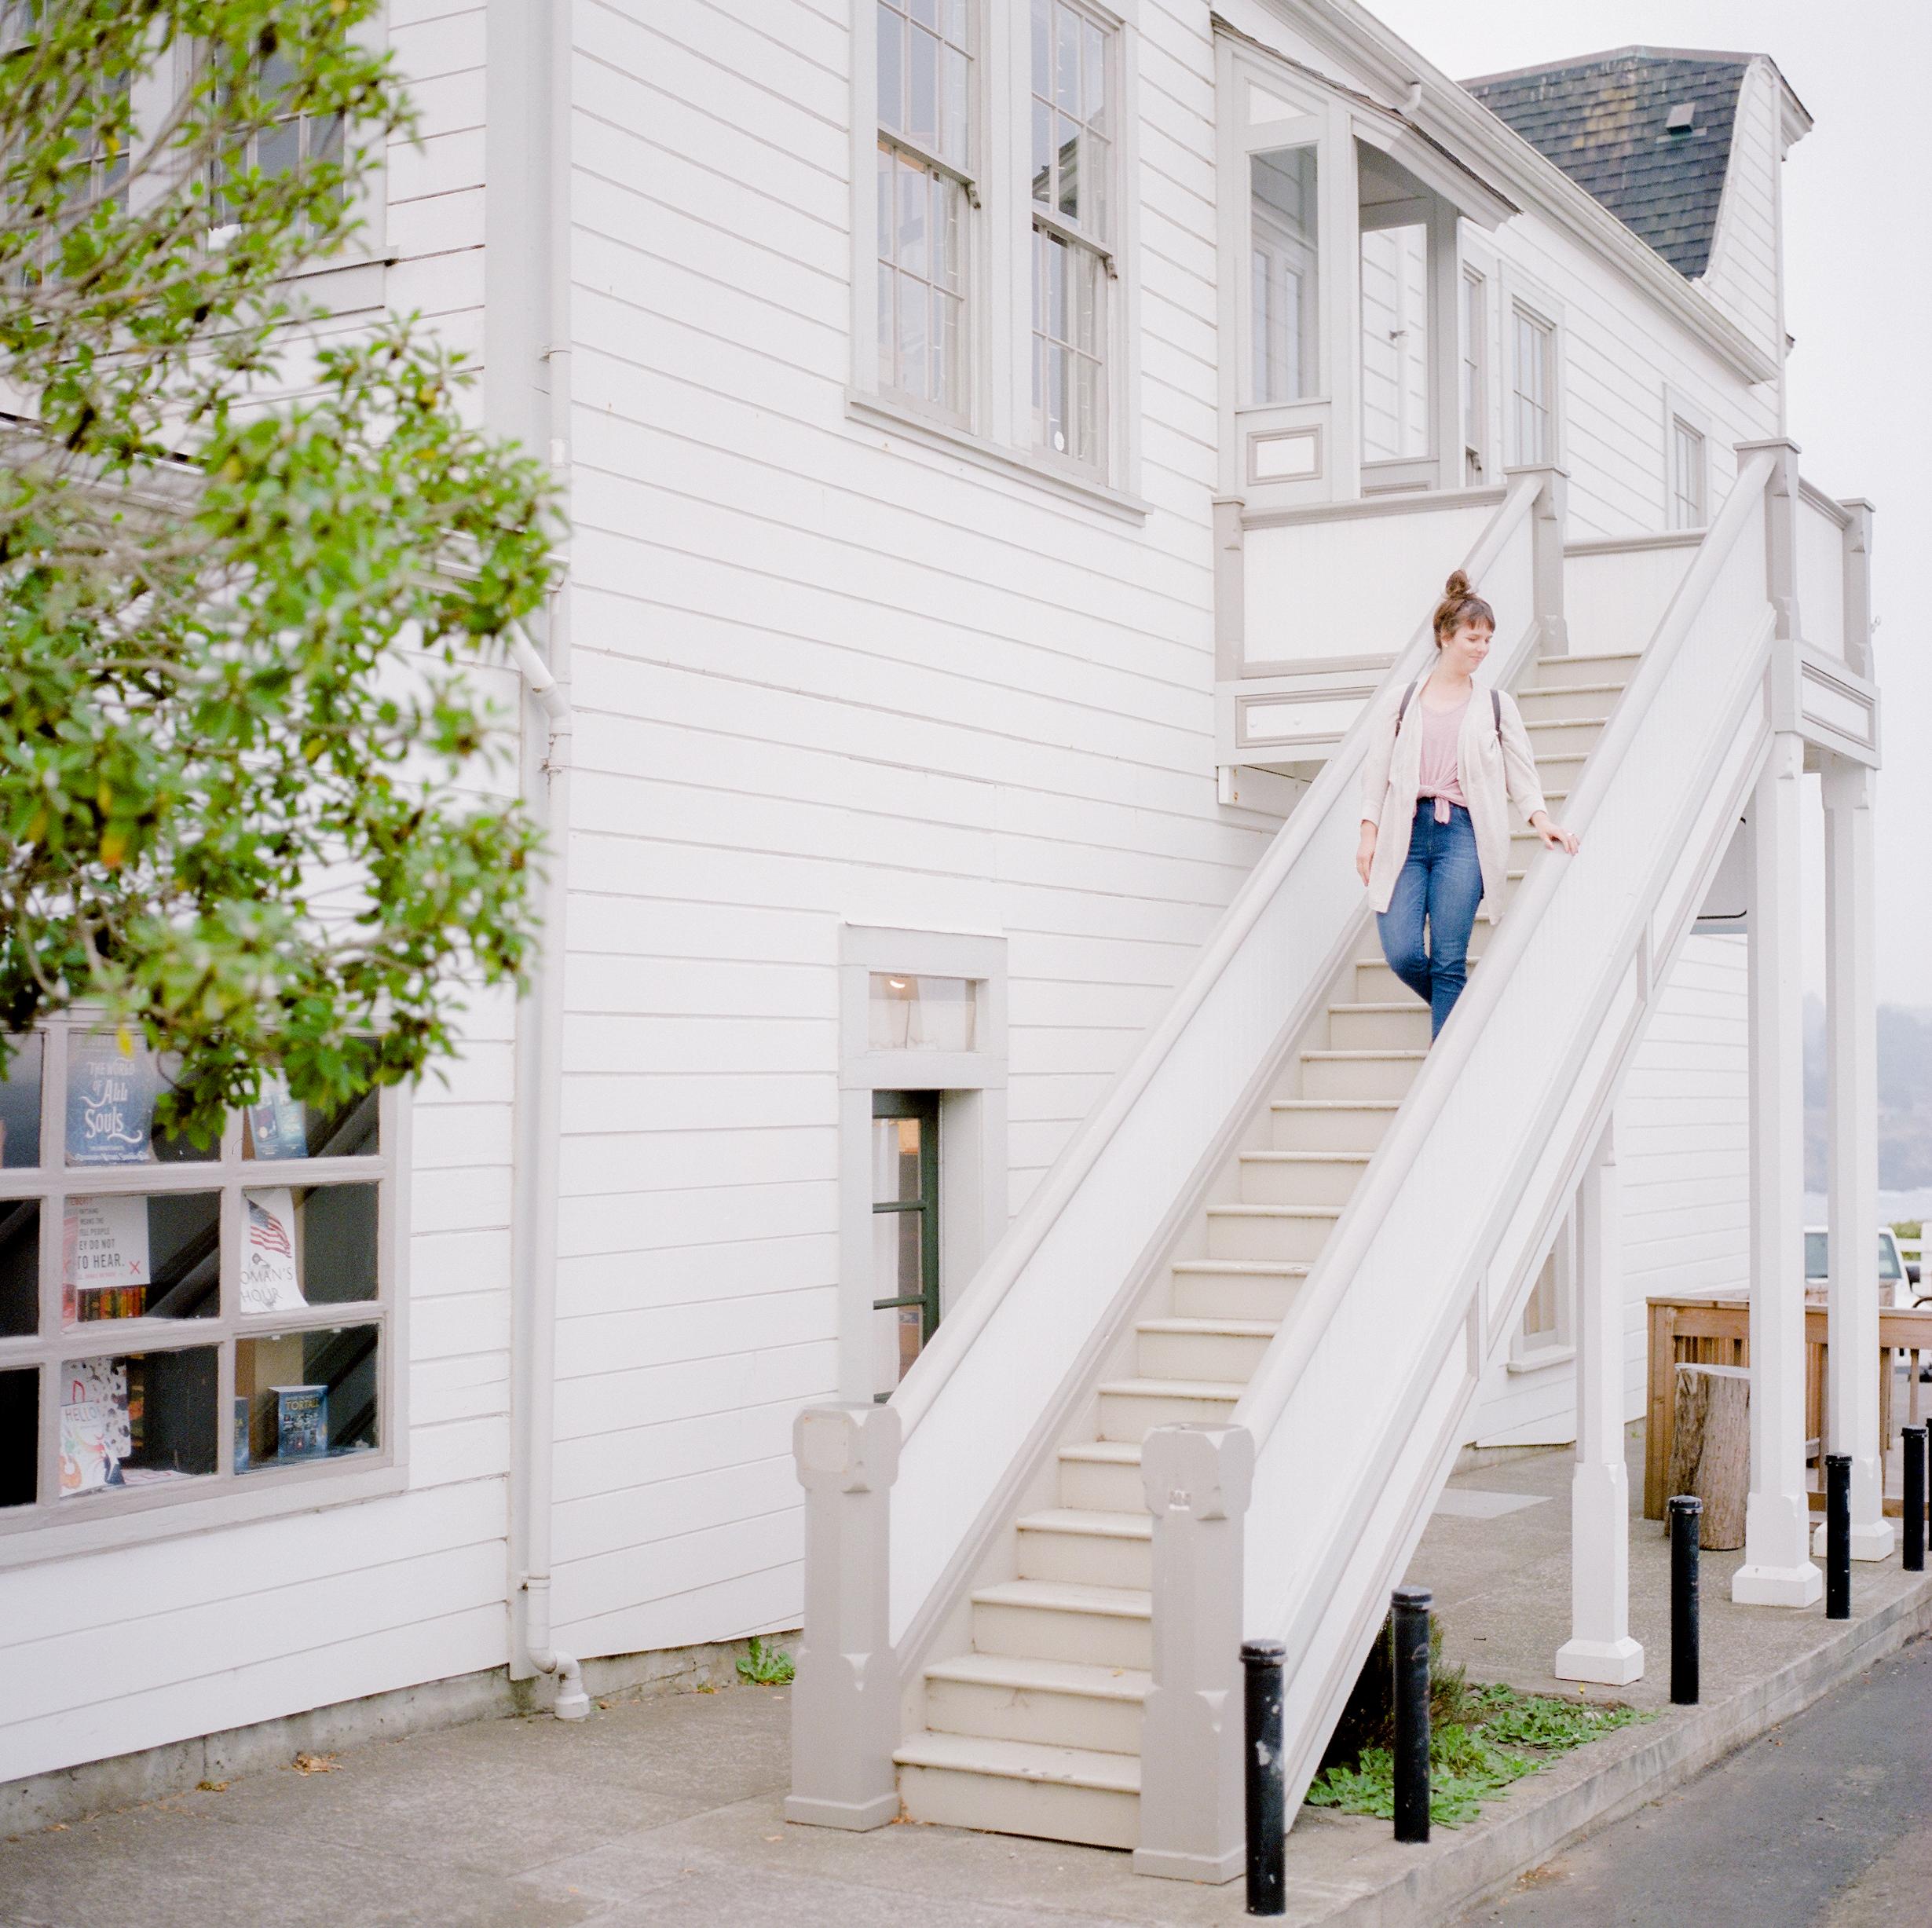 downtown-mendocino-lifestyle-photographer-25.jpg